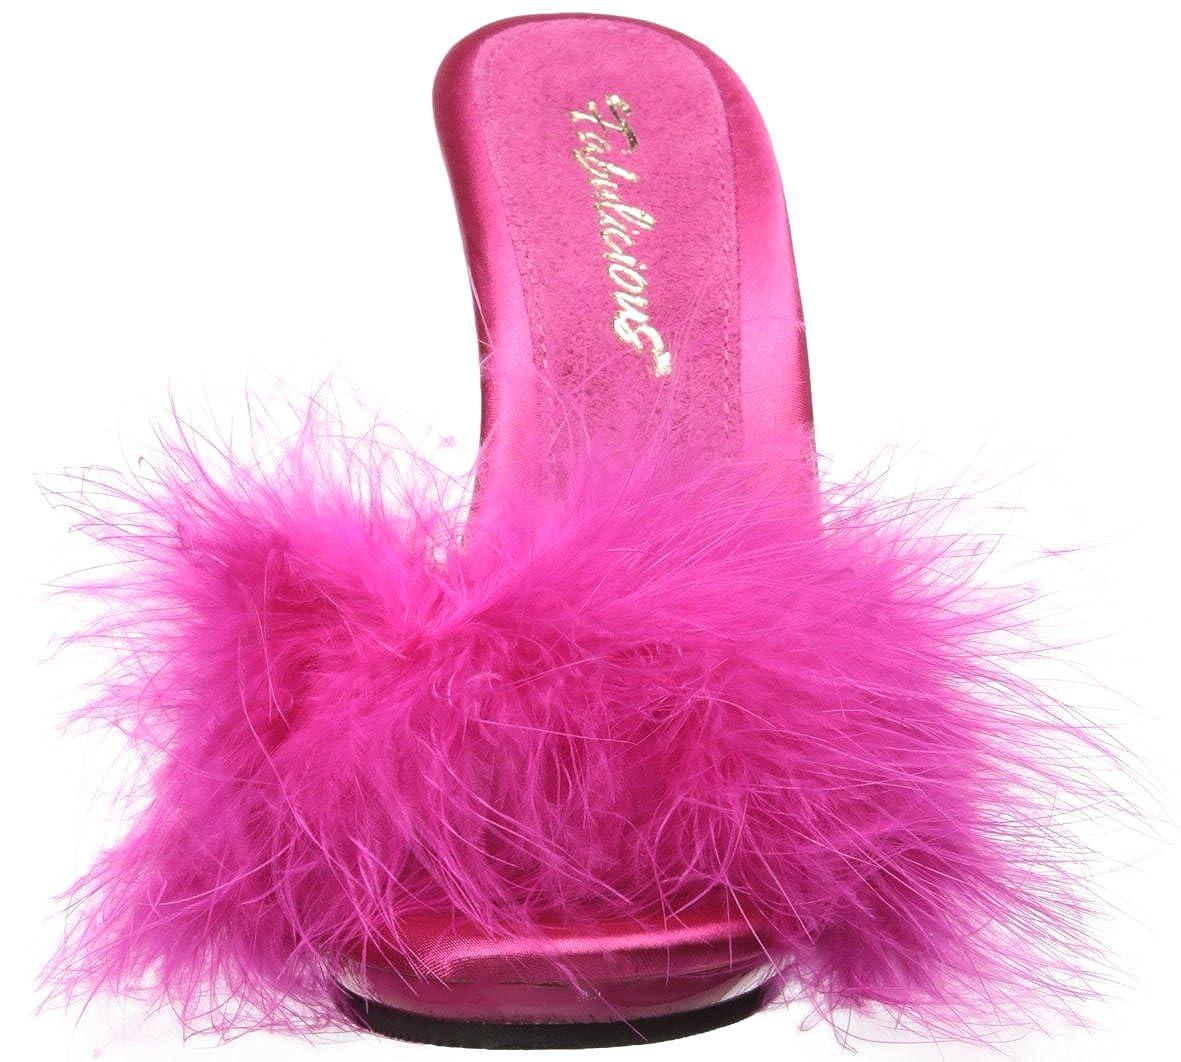 Fabulicious Damen Poise-501f Satin-marabou H. Pink Satin-marabou Poise-501f Fur/H. Pink 2f7f36